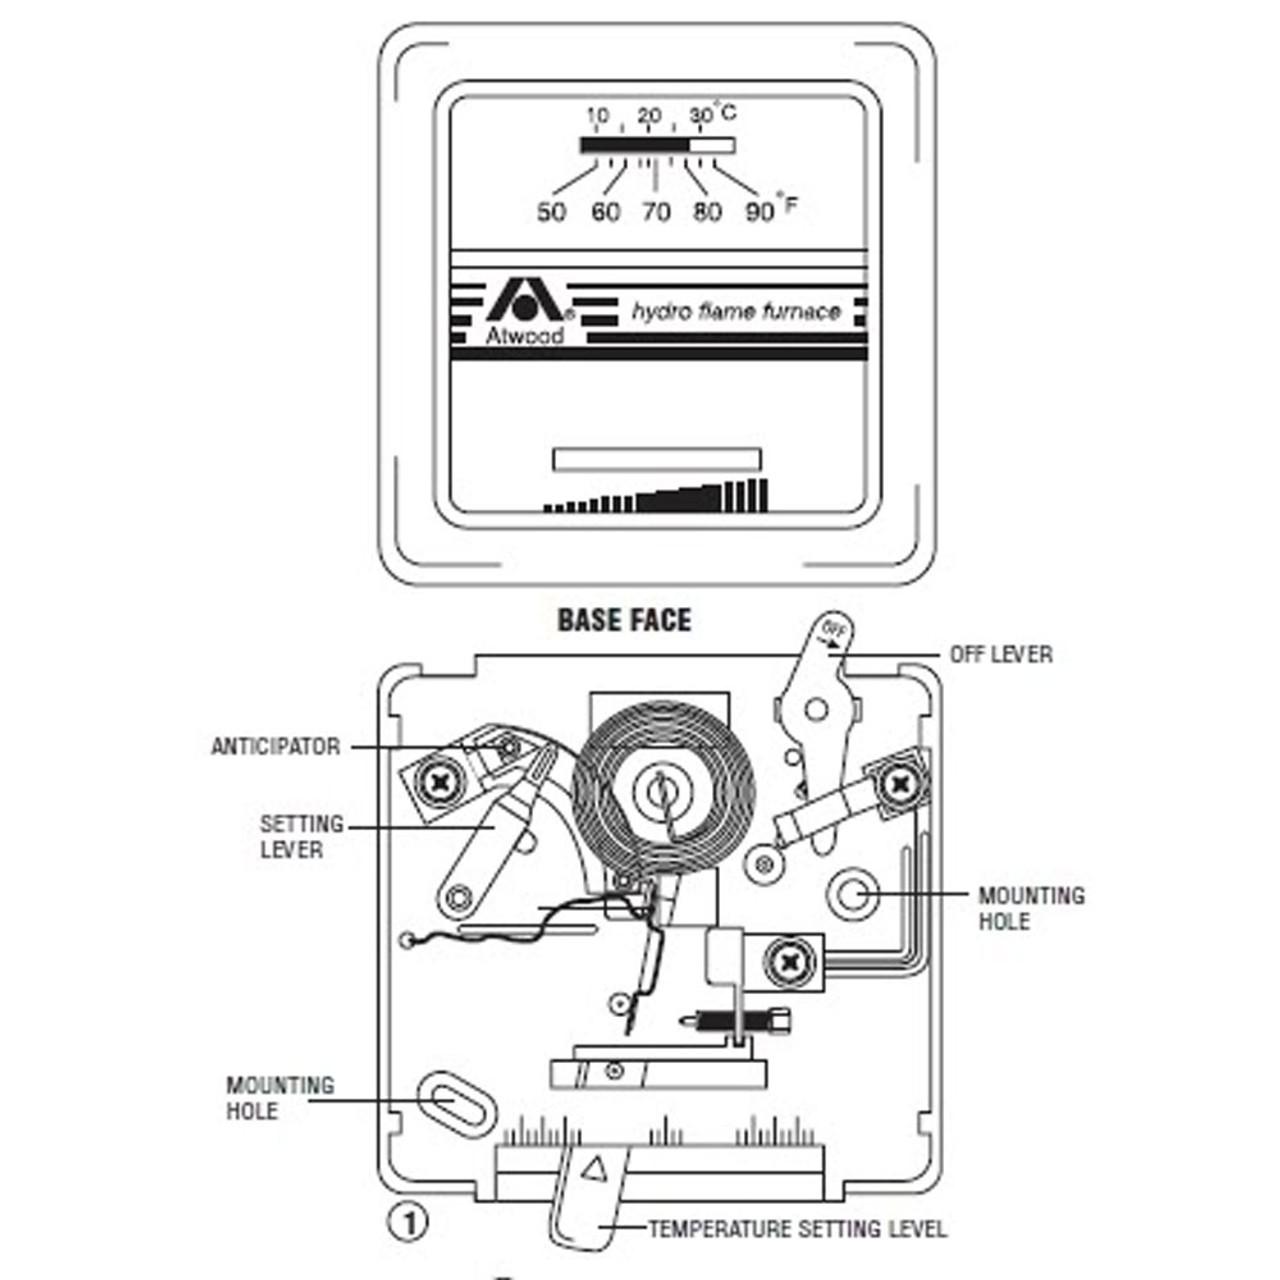 Atwood Rv Furnace Thermostat Wiring Ac Diagram 1987 Ford F 150 Lariat Radio